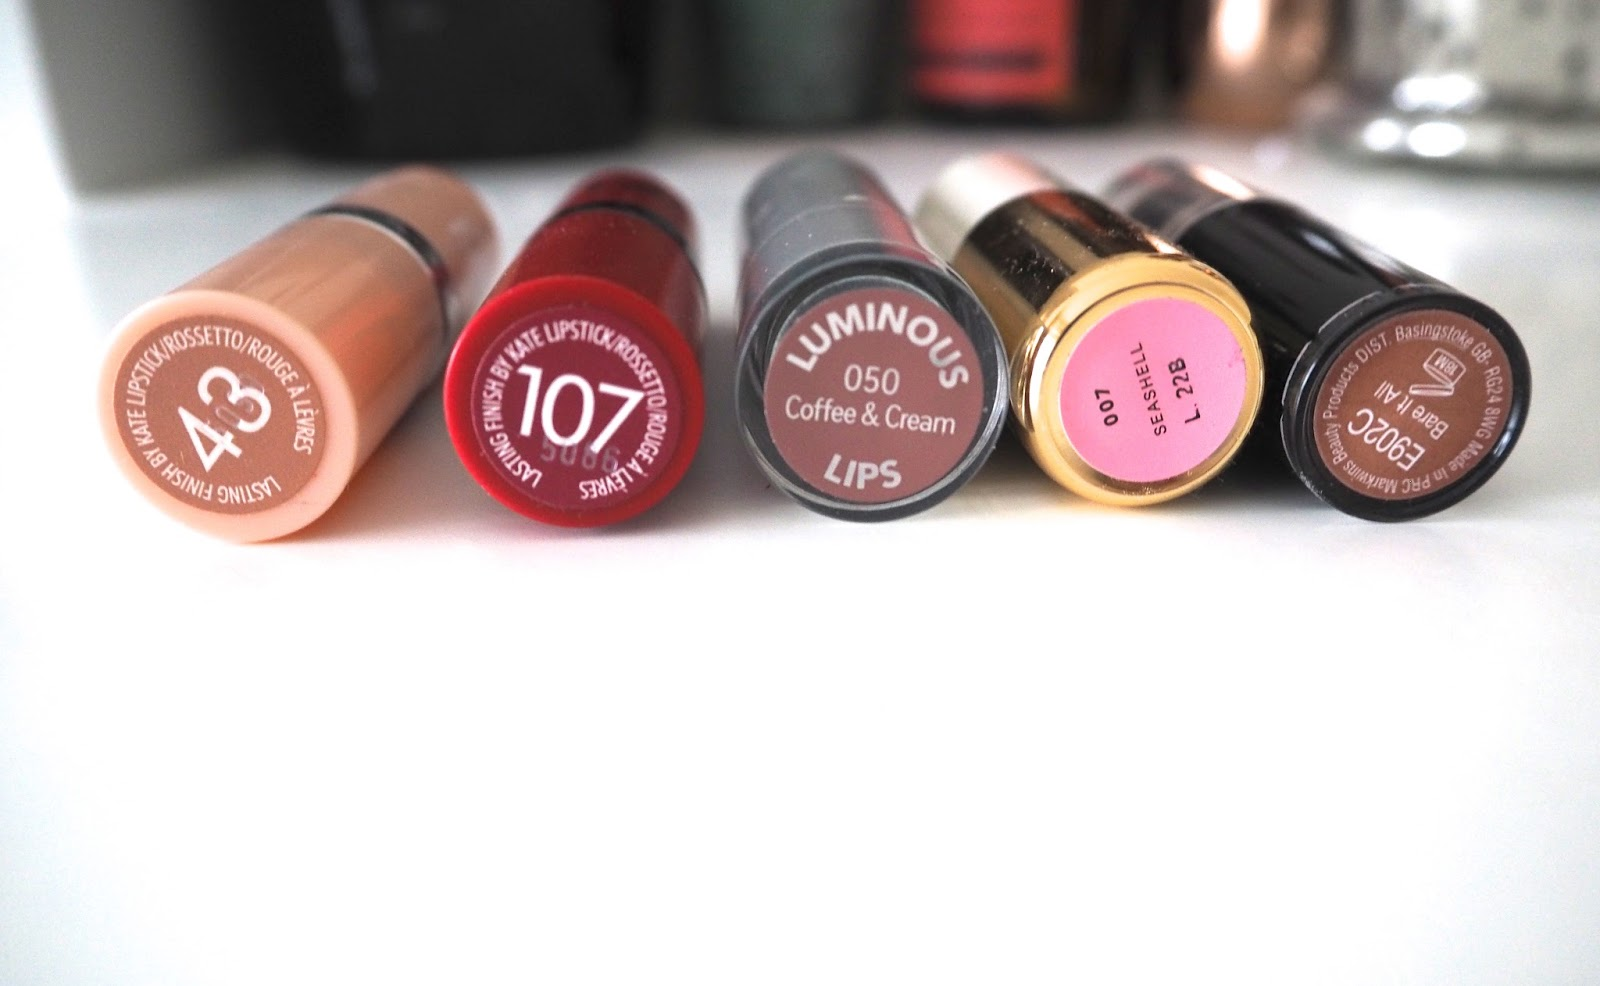 My Favourite Drugstore Lipsticks, best drugstore lipsticks, nude, bold, pink, red, rimmel kate moss, 43, 107, catrice luminous lips lipstick, h&m beauty, hm, seashell, wet 'n wild bare it all, megalast lipstick, swatches